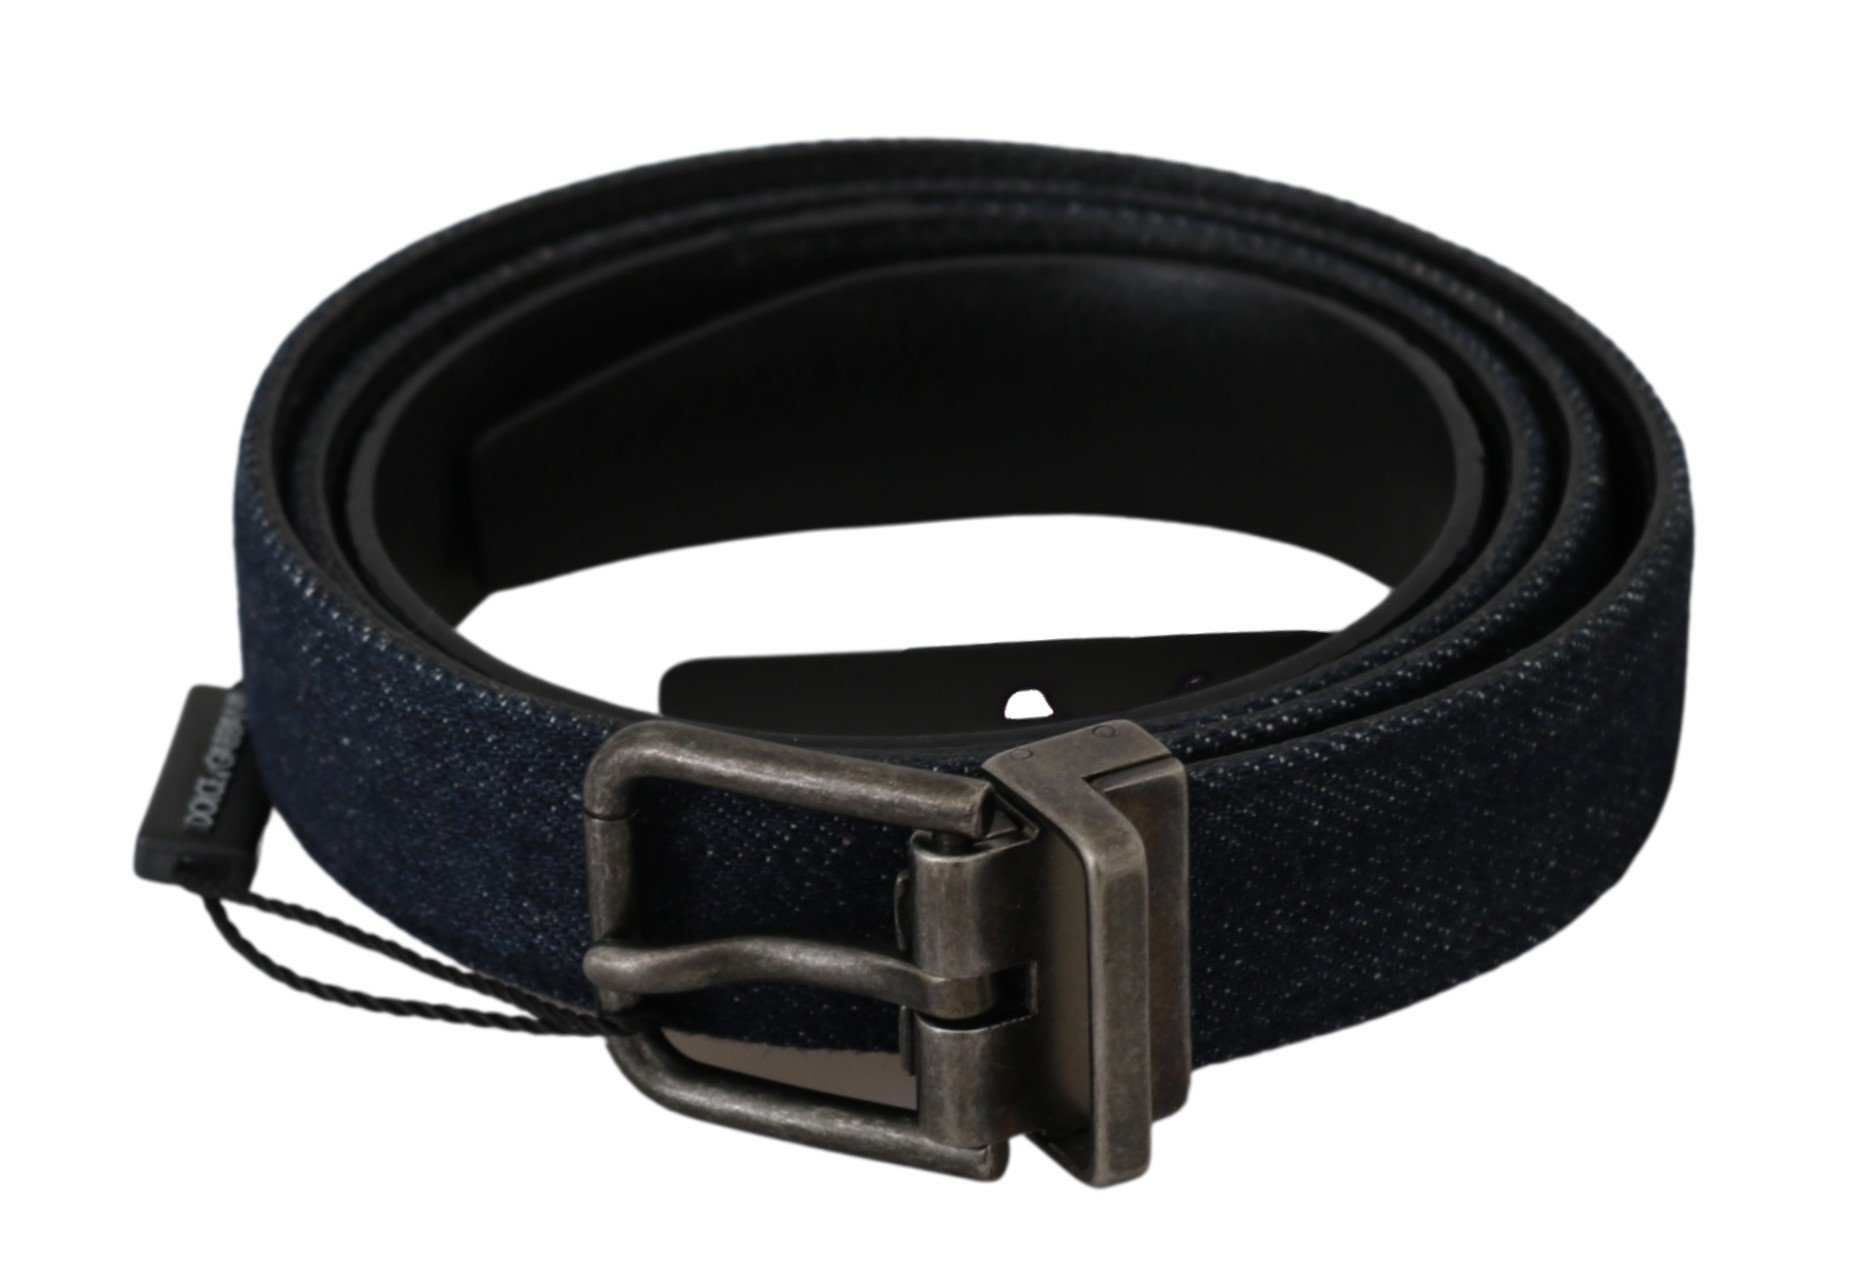 Dolce & Gabbana Men's Buckle Denim Caiman Belt Black BEL60497 - 100 cm / 40 Inches